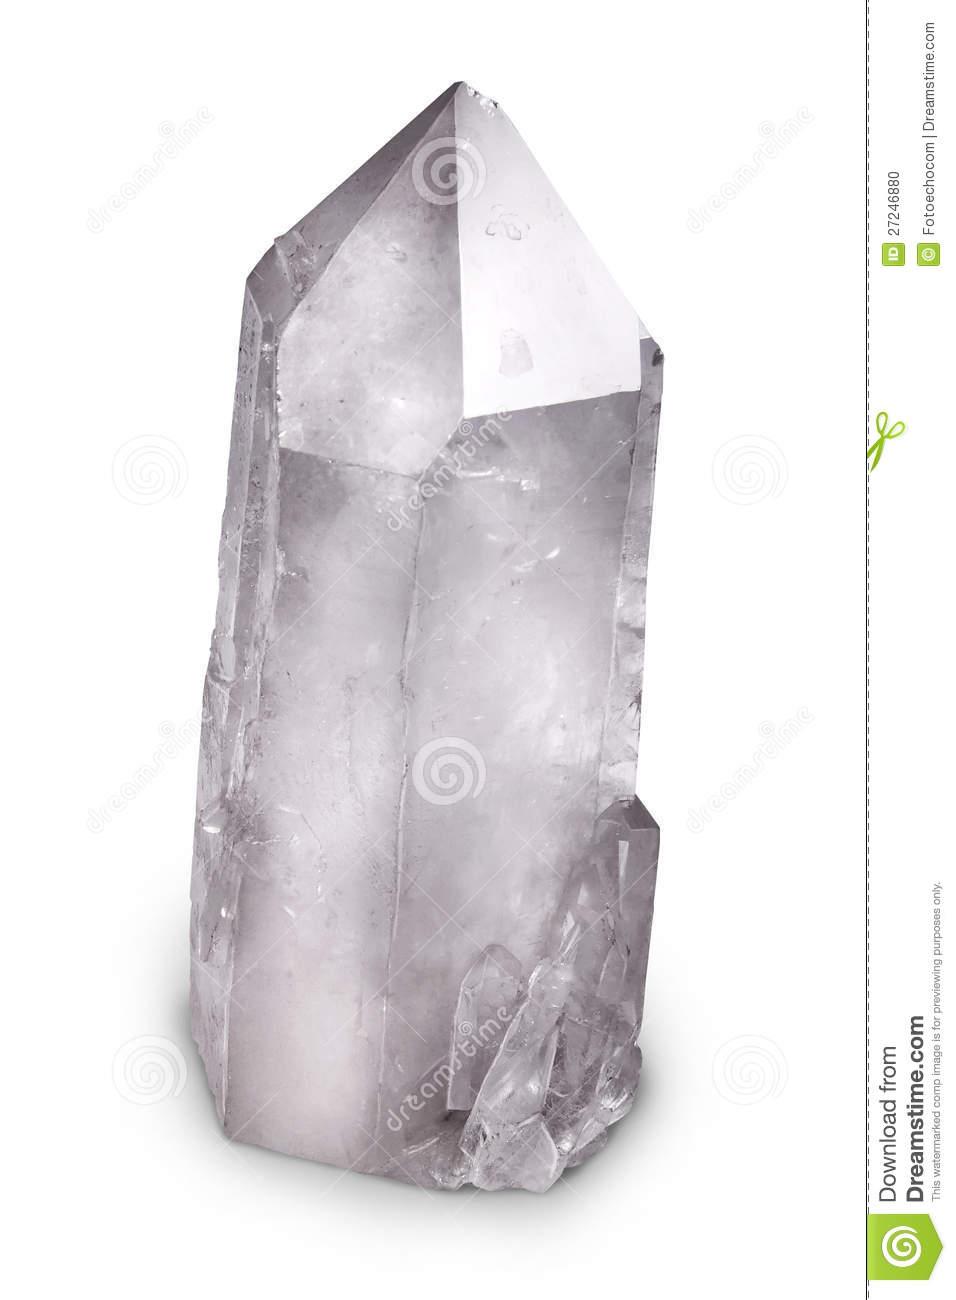 Natural Quartz Berg Crystal Stock Photo.